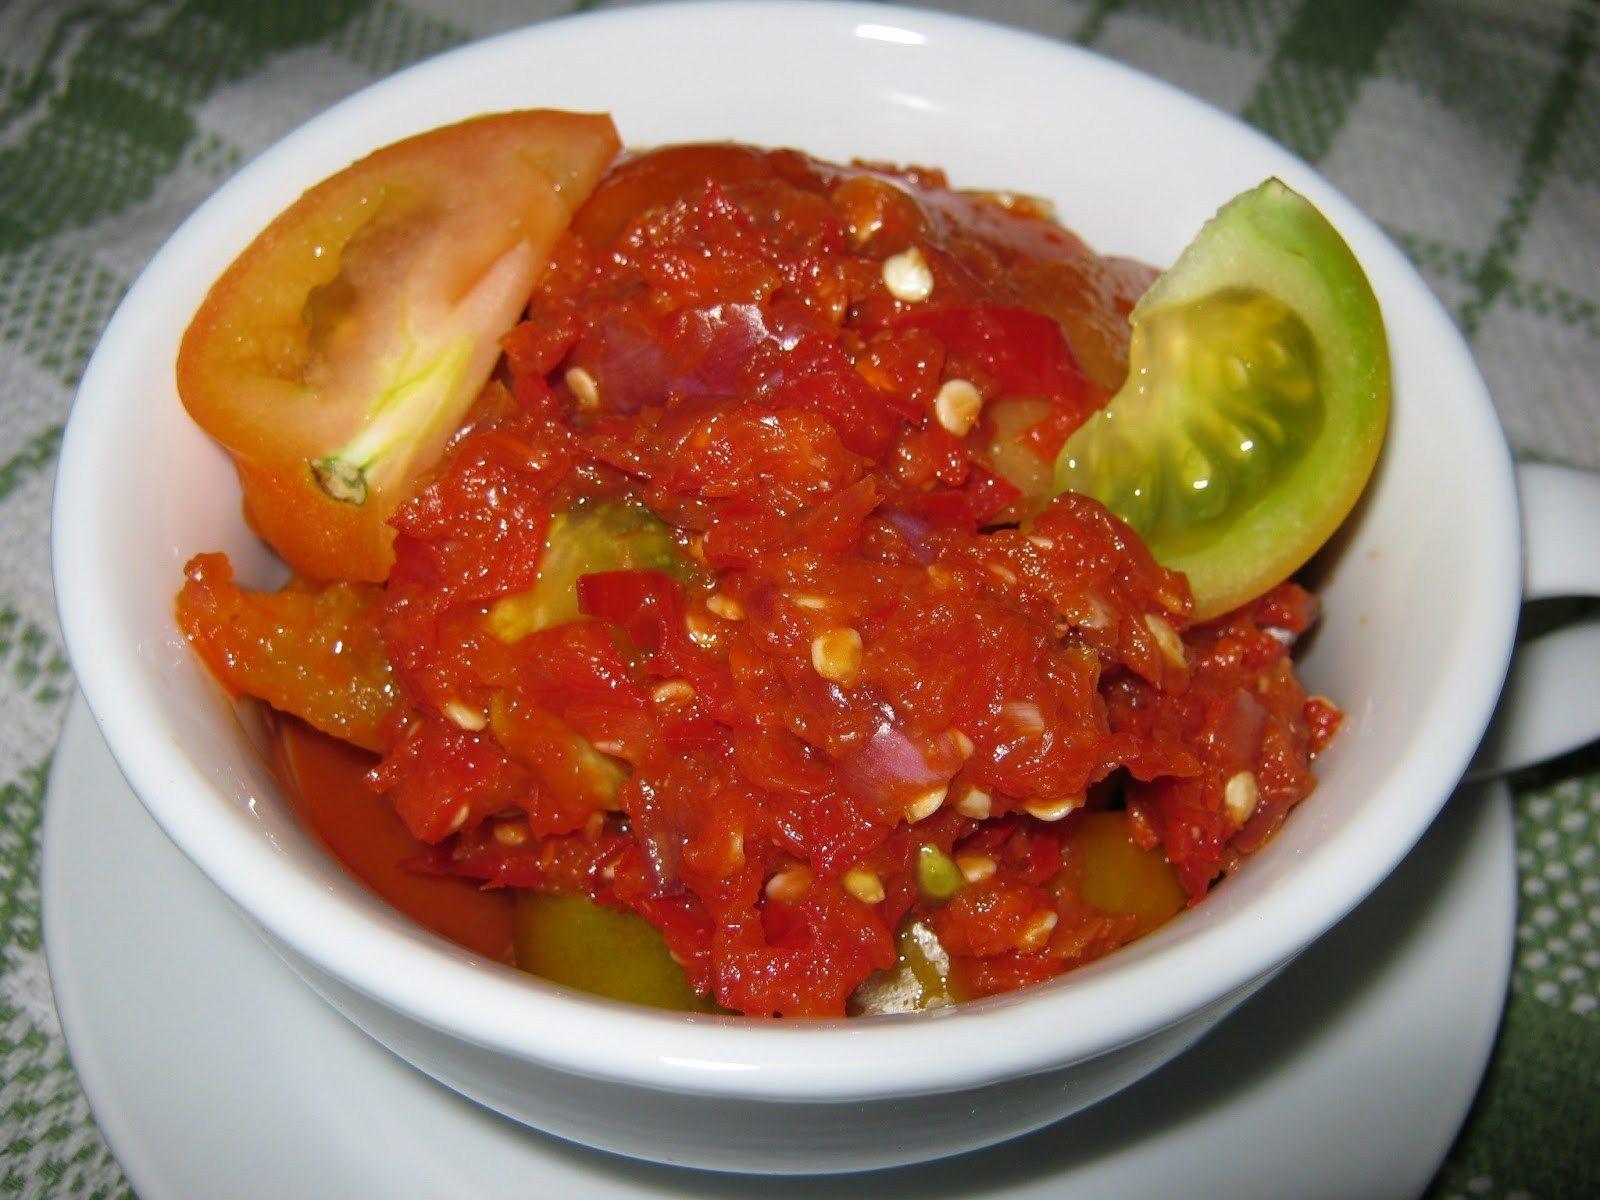 5 Resepi Sambal Belacan Yang Meletup Masakan Indonesia Makanan Masakan